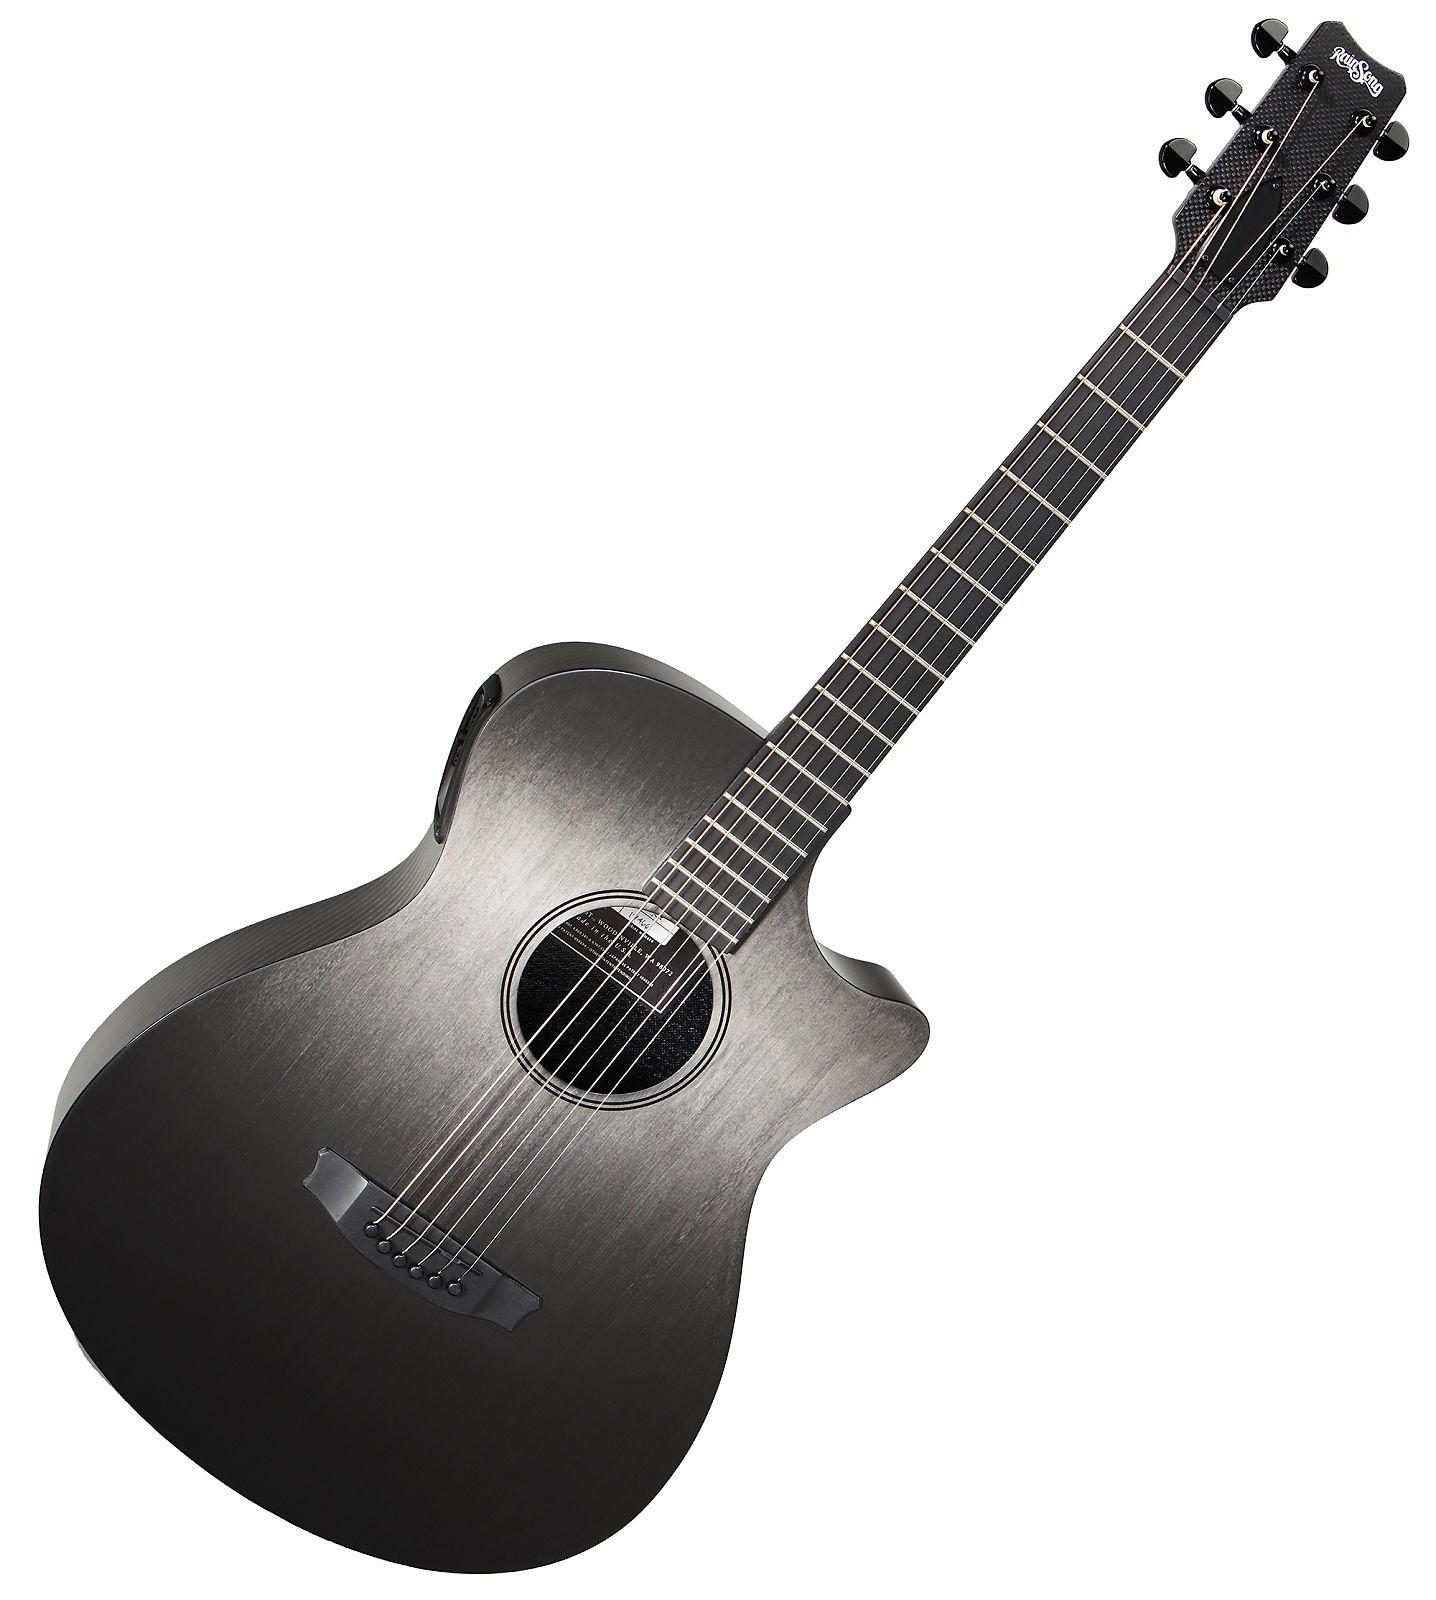 rainsong concert hybrid ch om1000ns acoustic electric guitar case the guitar hangar. Black Bedroom Furniture Sets. Home Design Ideas